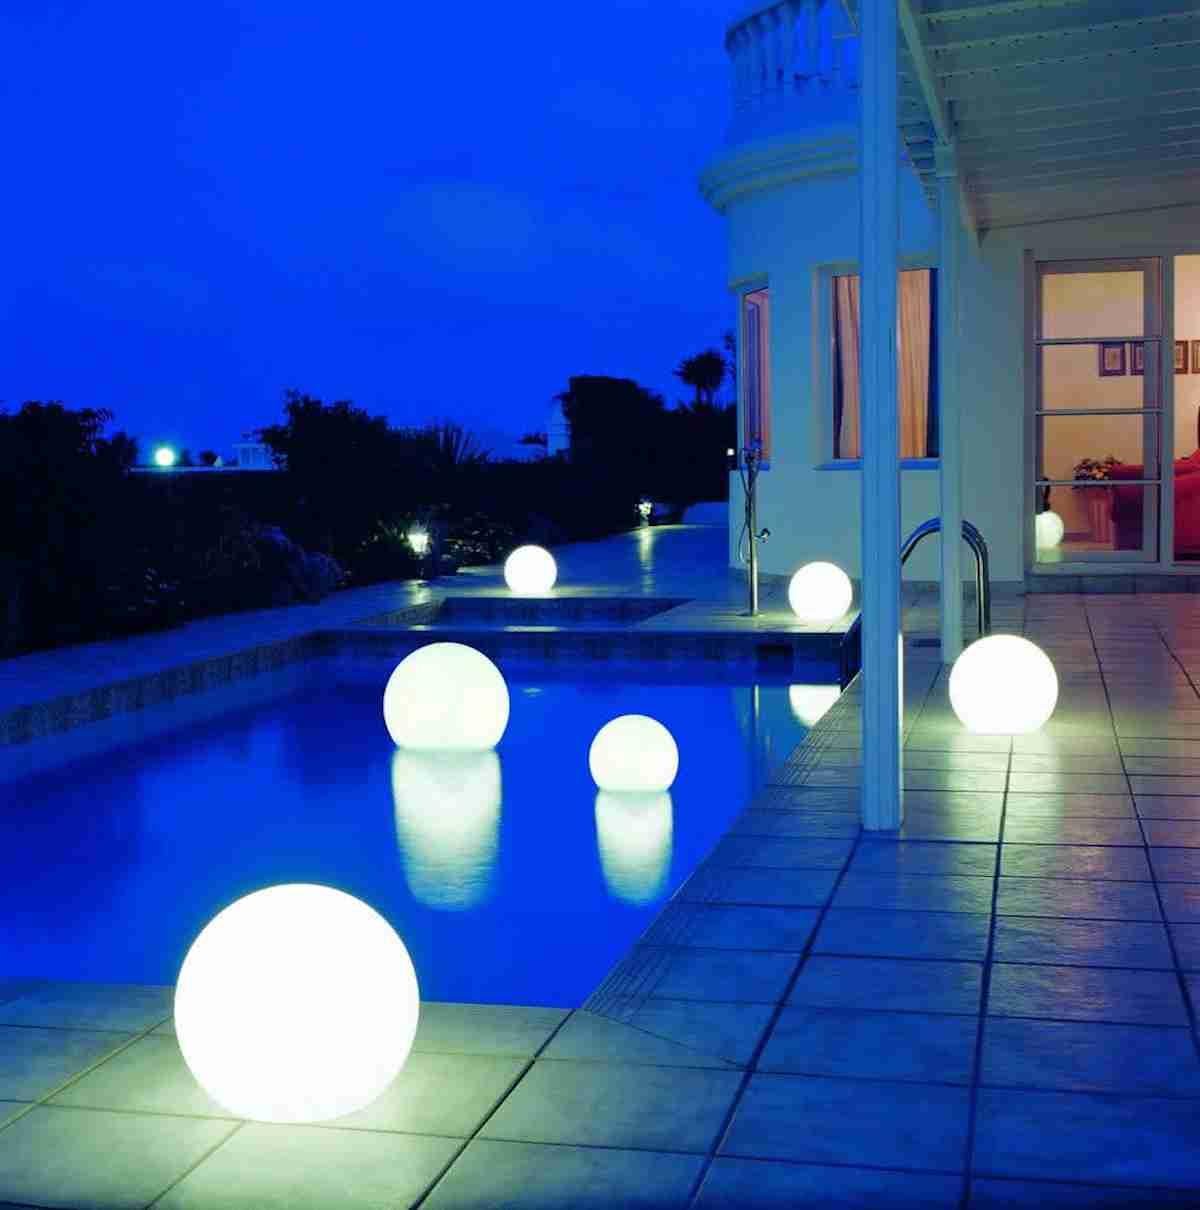 Luces solares para iluminar los espacios exteriores 30